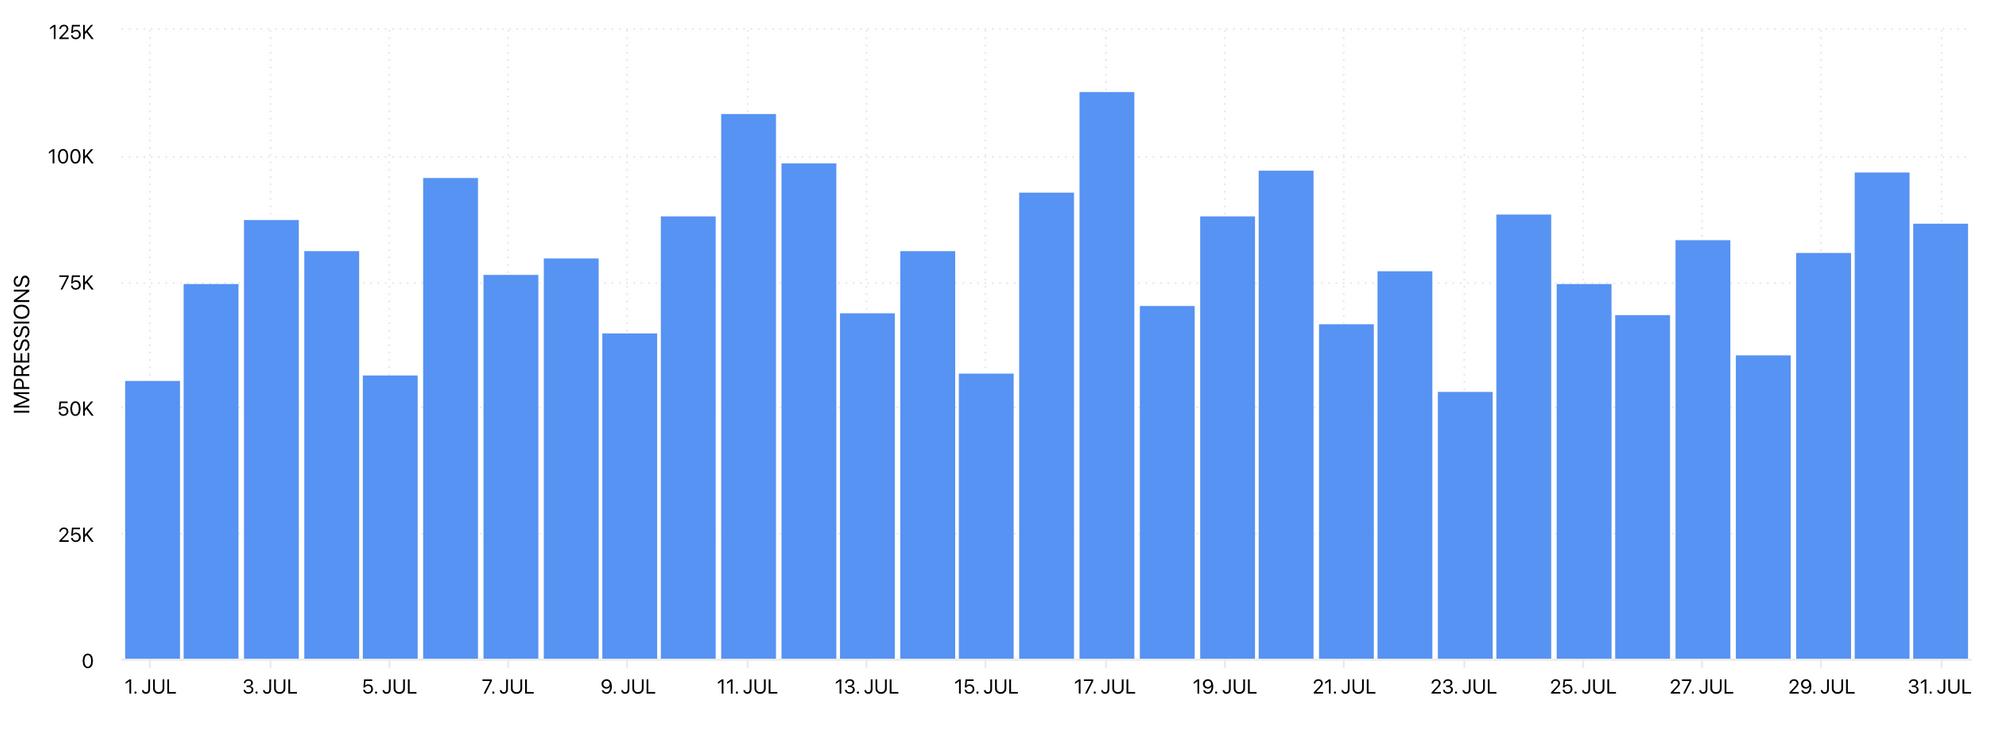 Impressions graph by Minter.io